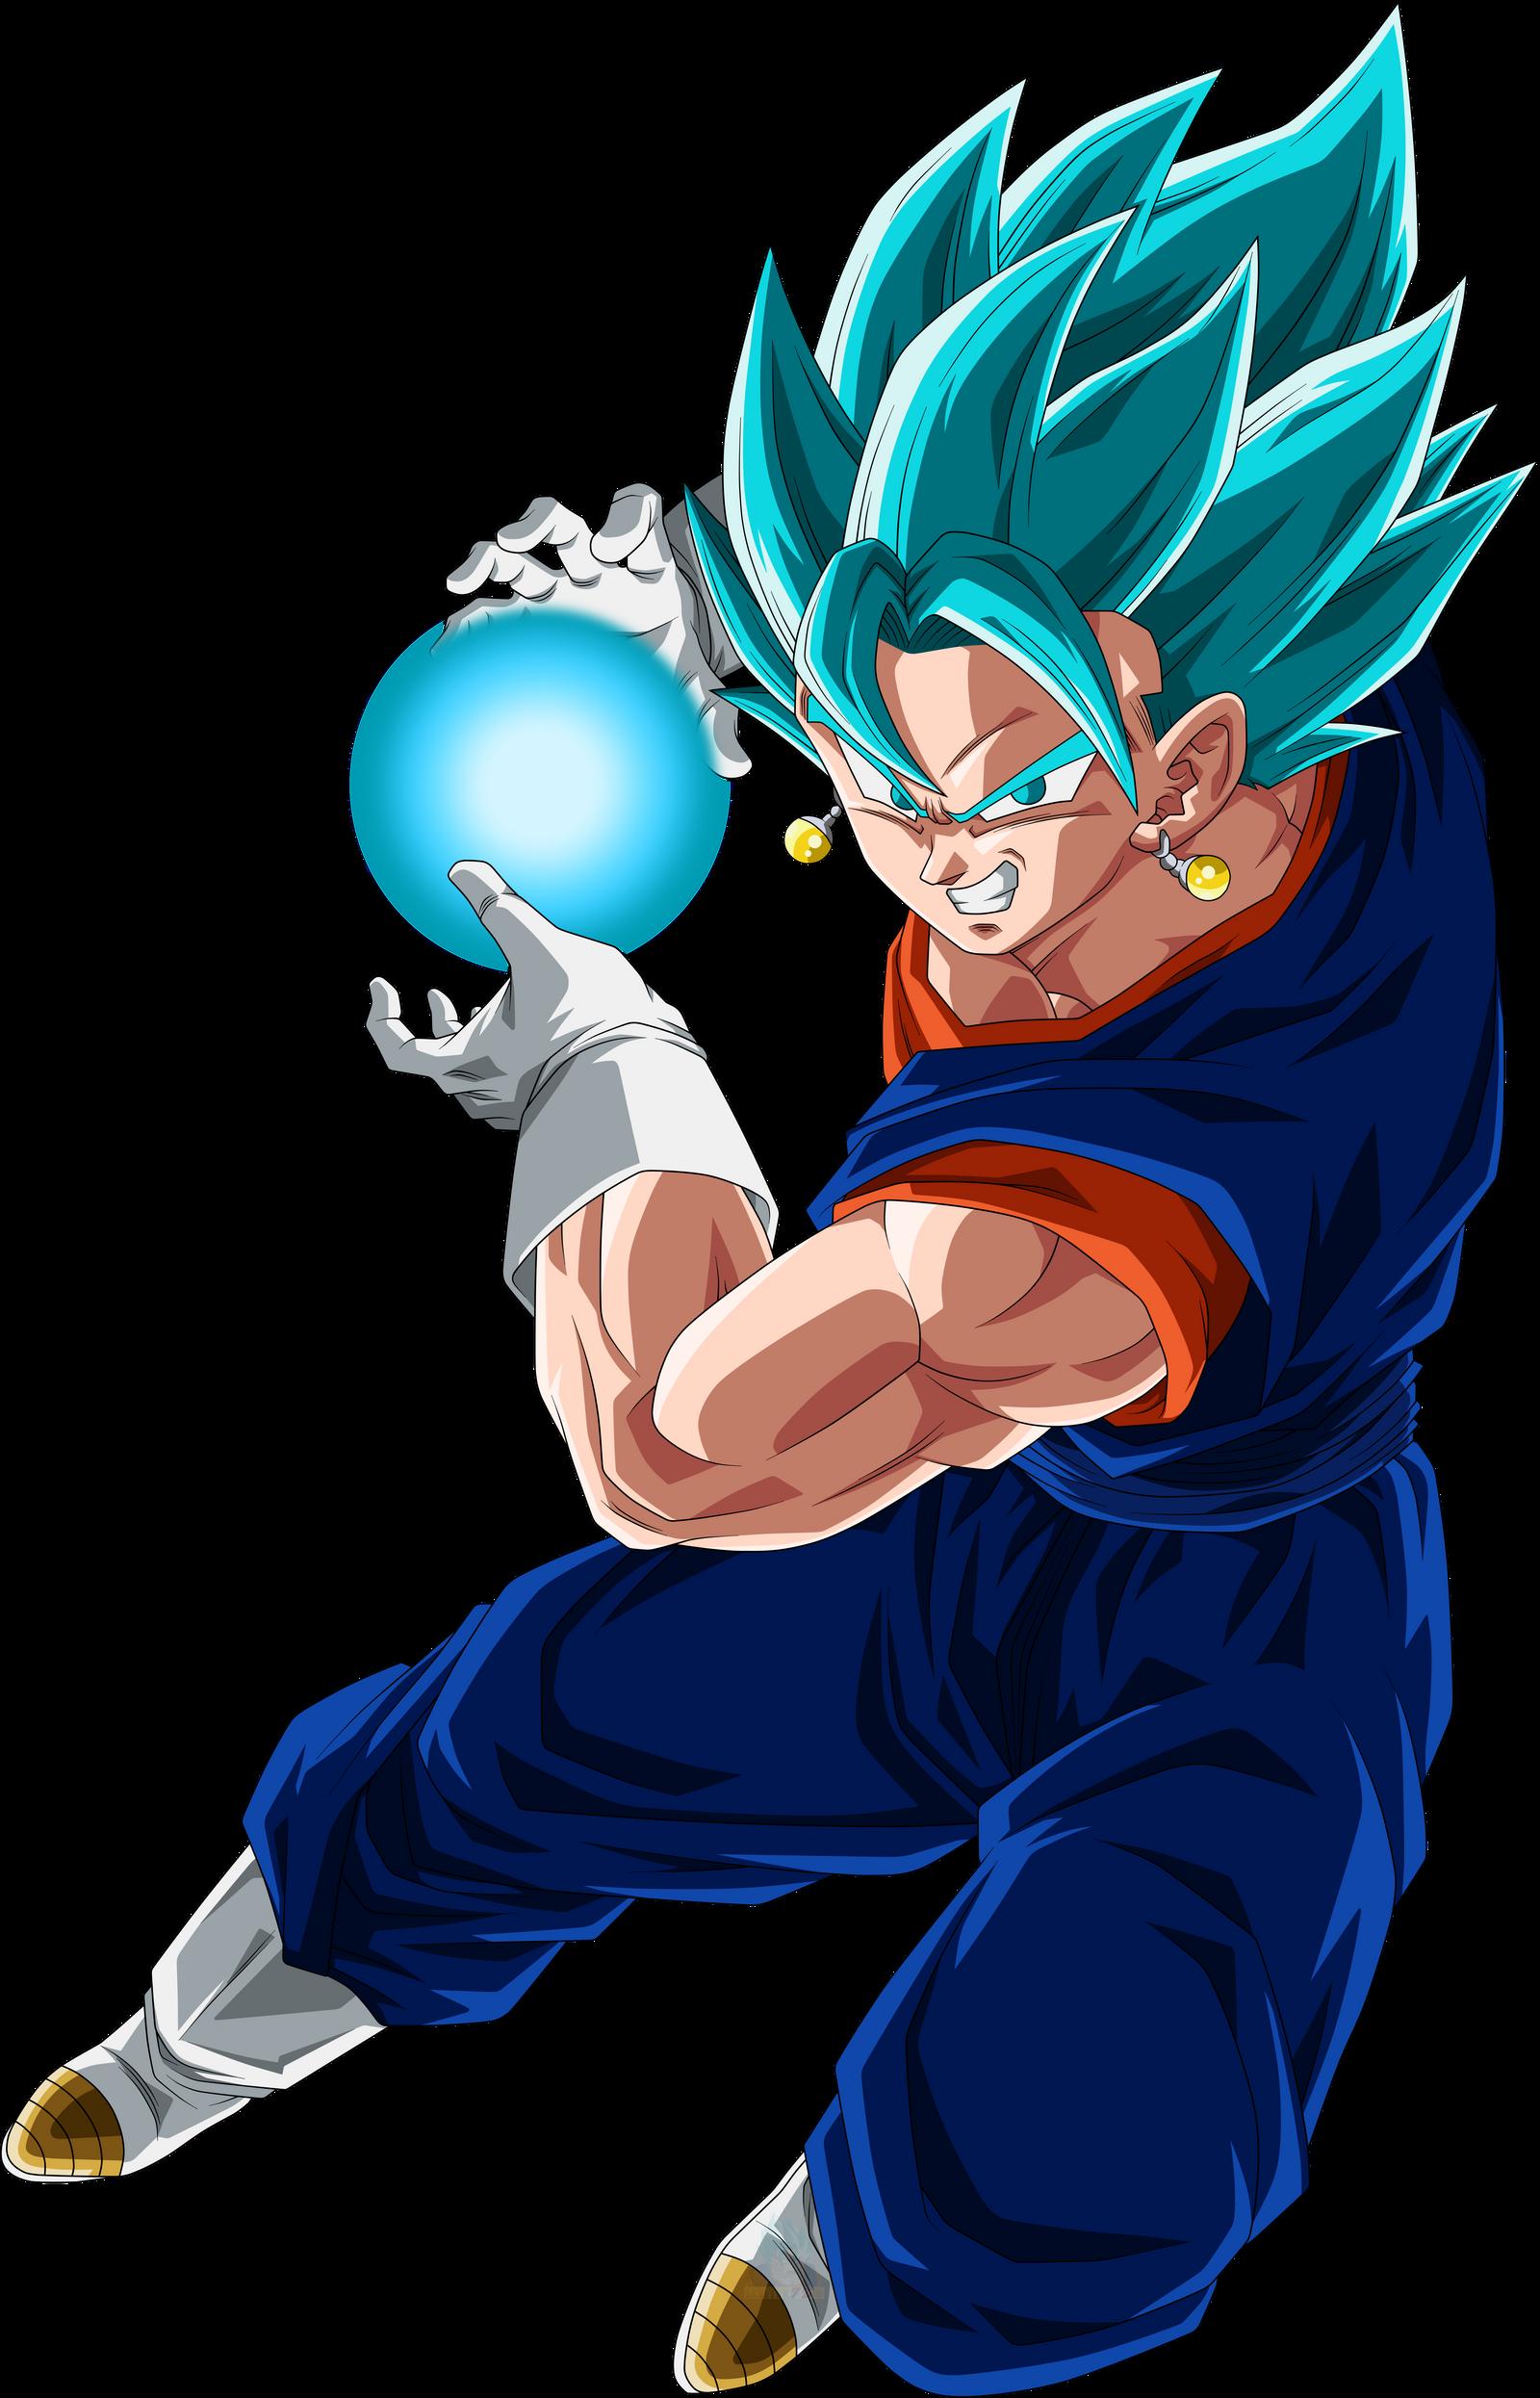 Vegetto Super Saiyajin Blue by arbiter720 on DeviantArt